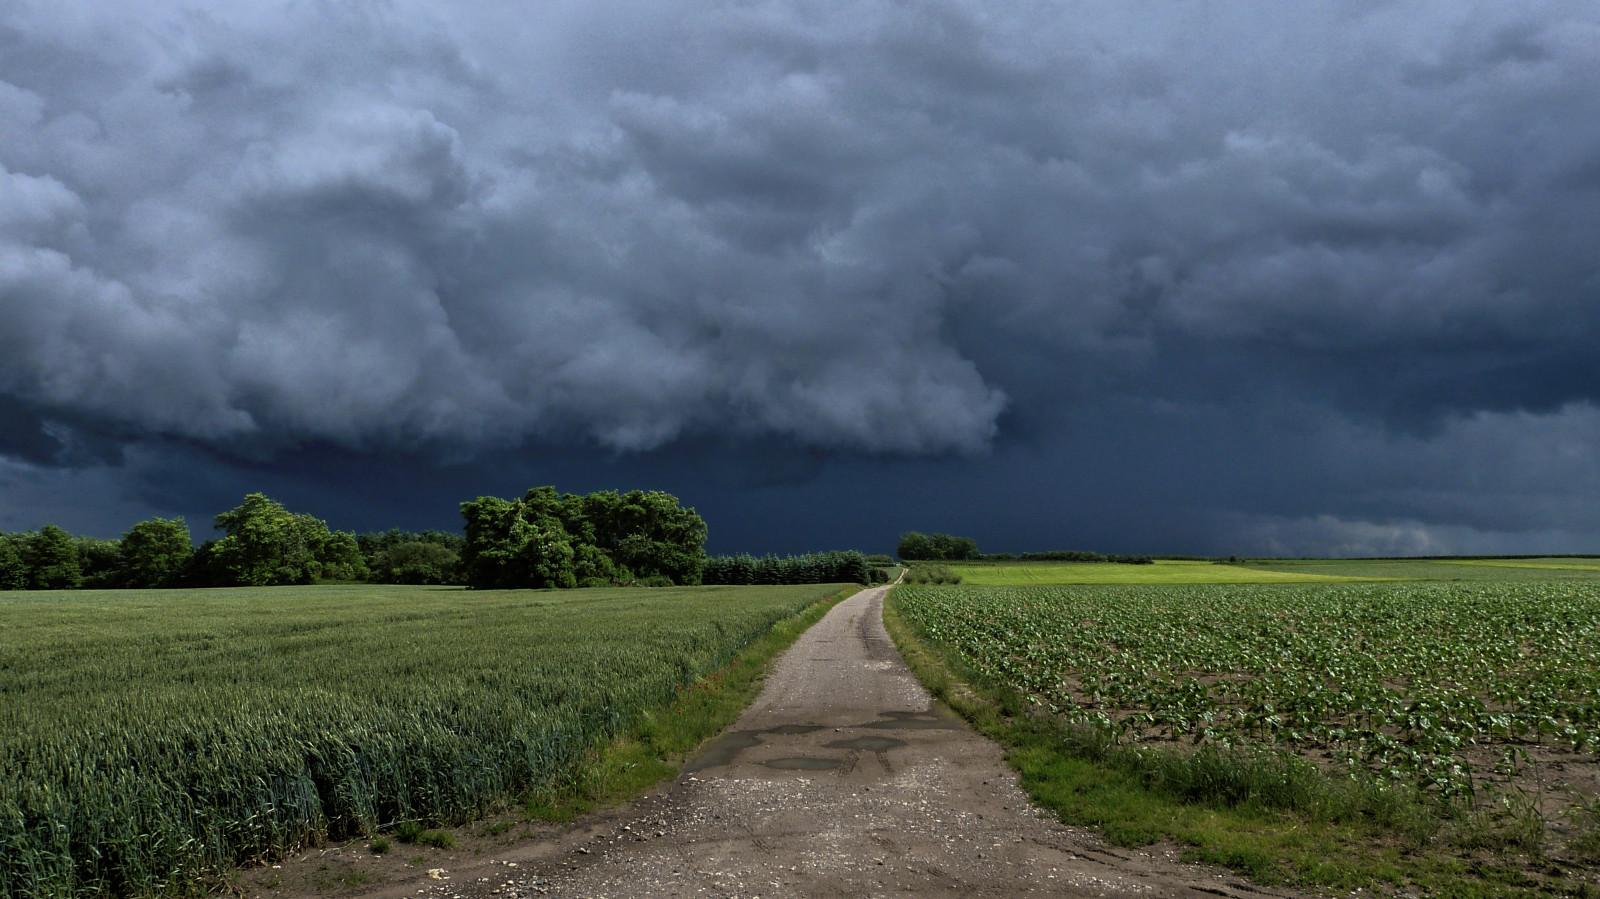 dirt_road_drama_rain_clouds_heavy_atmosphere_landscape-913758.jpg!d